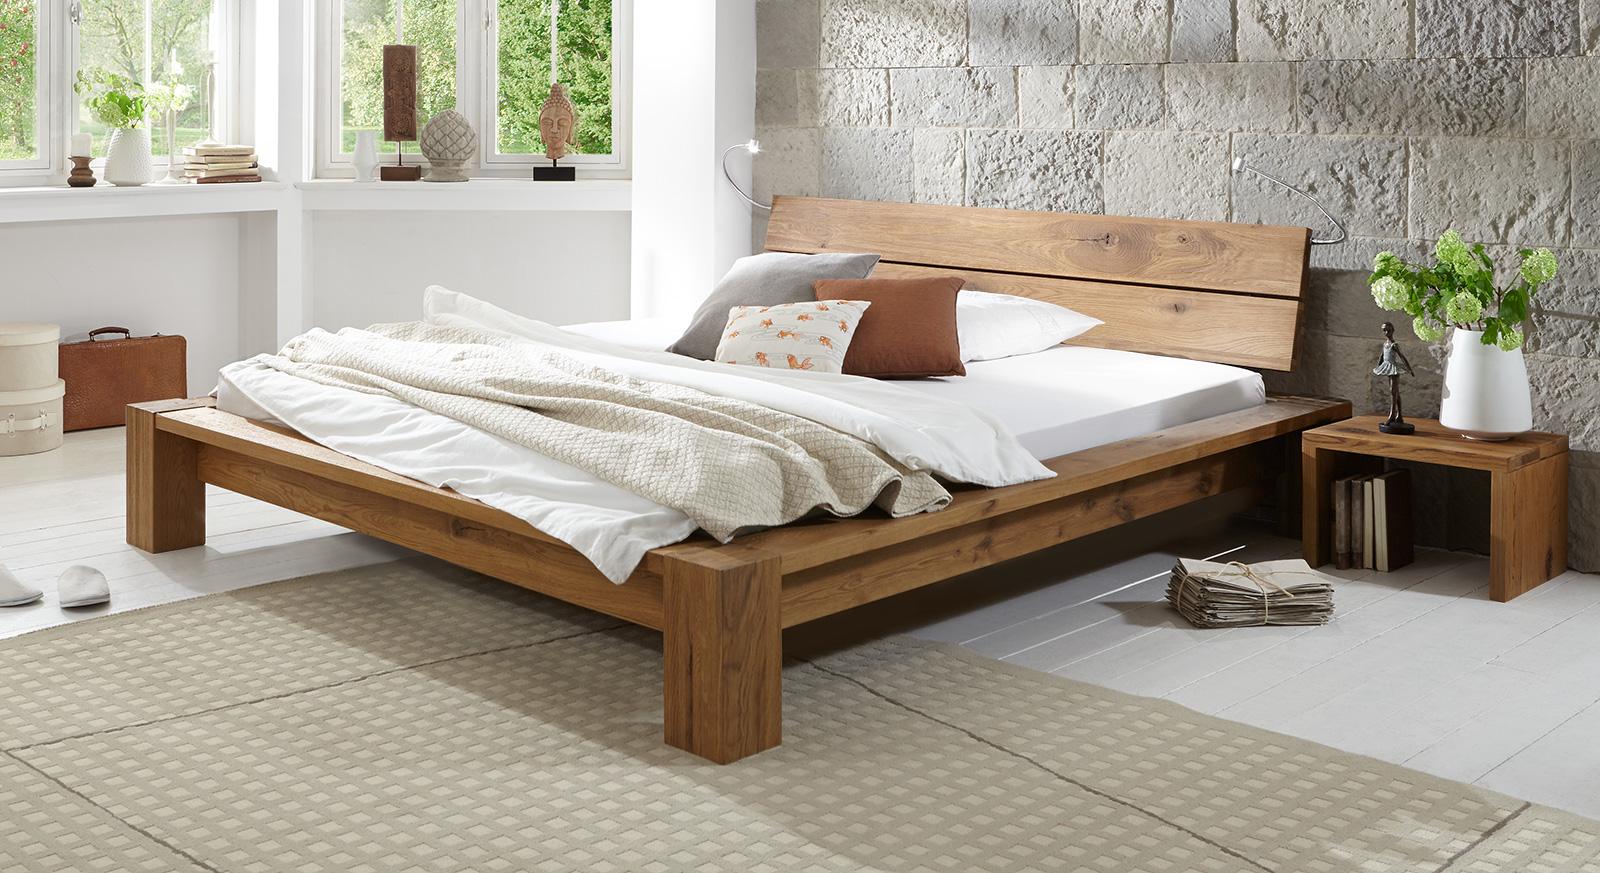 Holzbett rustikal  Massivholzbett in Komforthöhe aus geölter Wildeiche - Navia